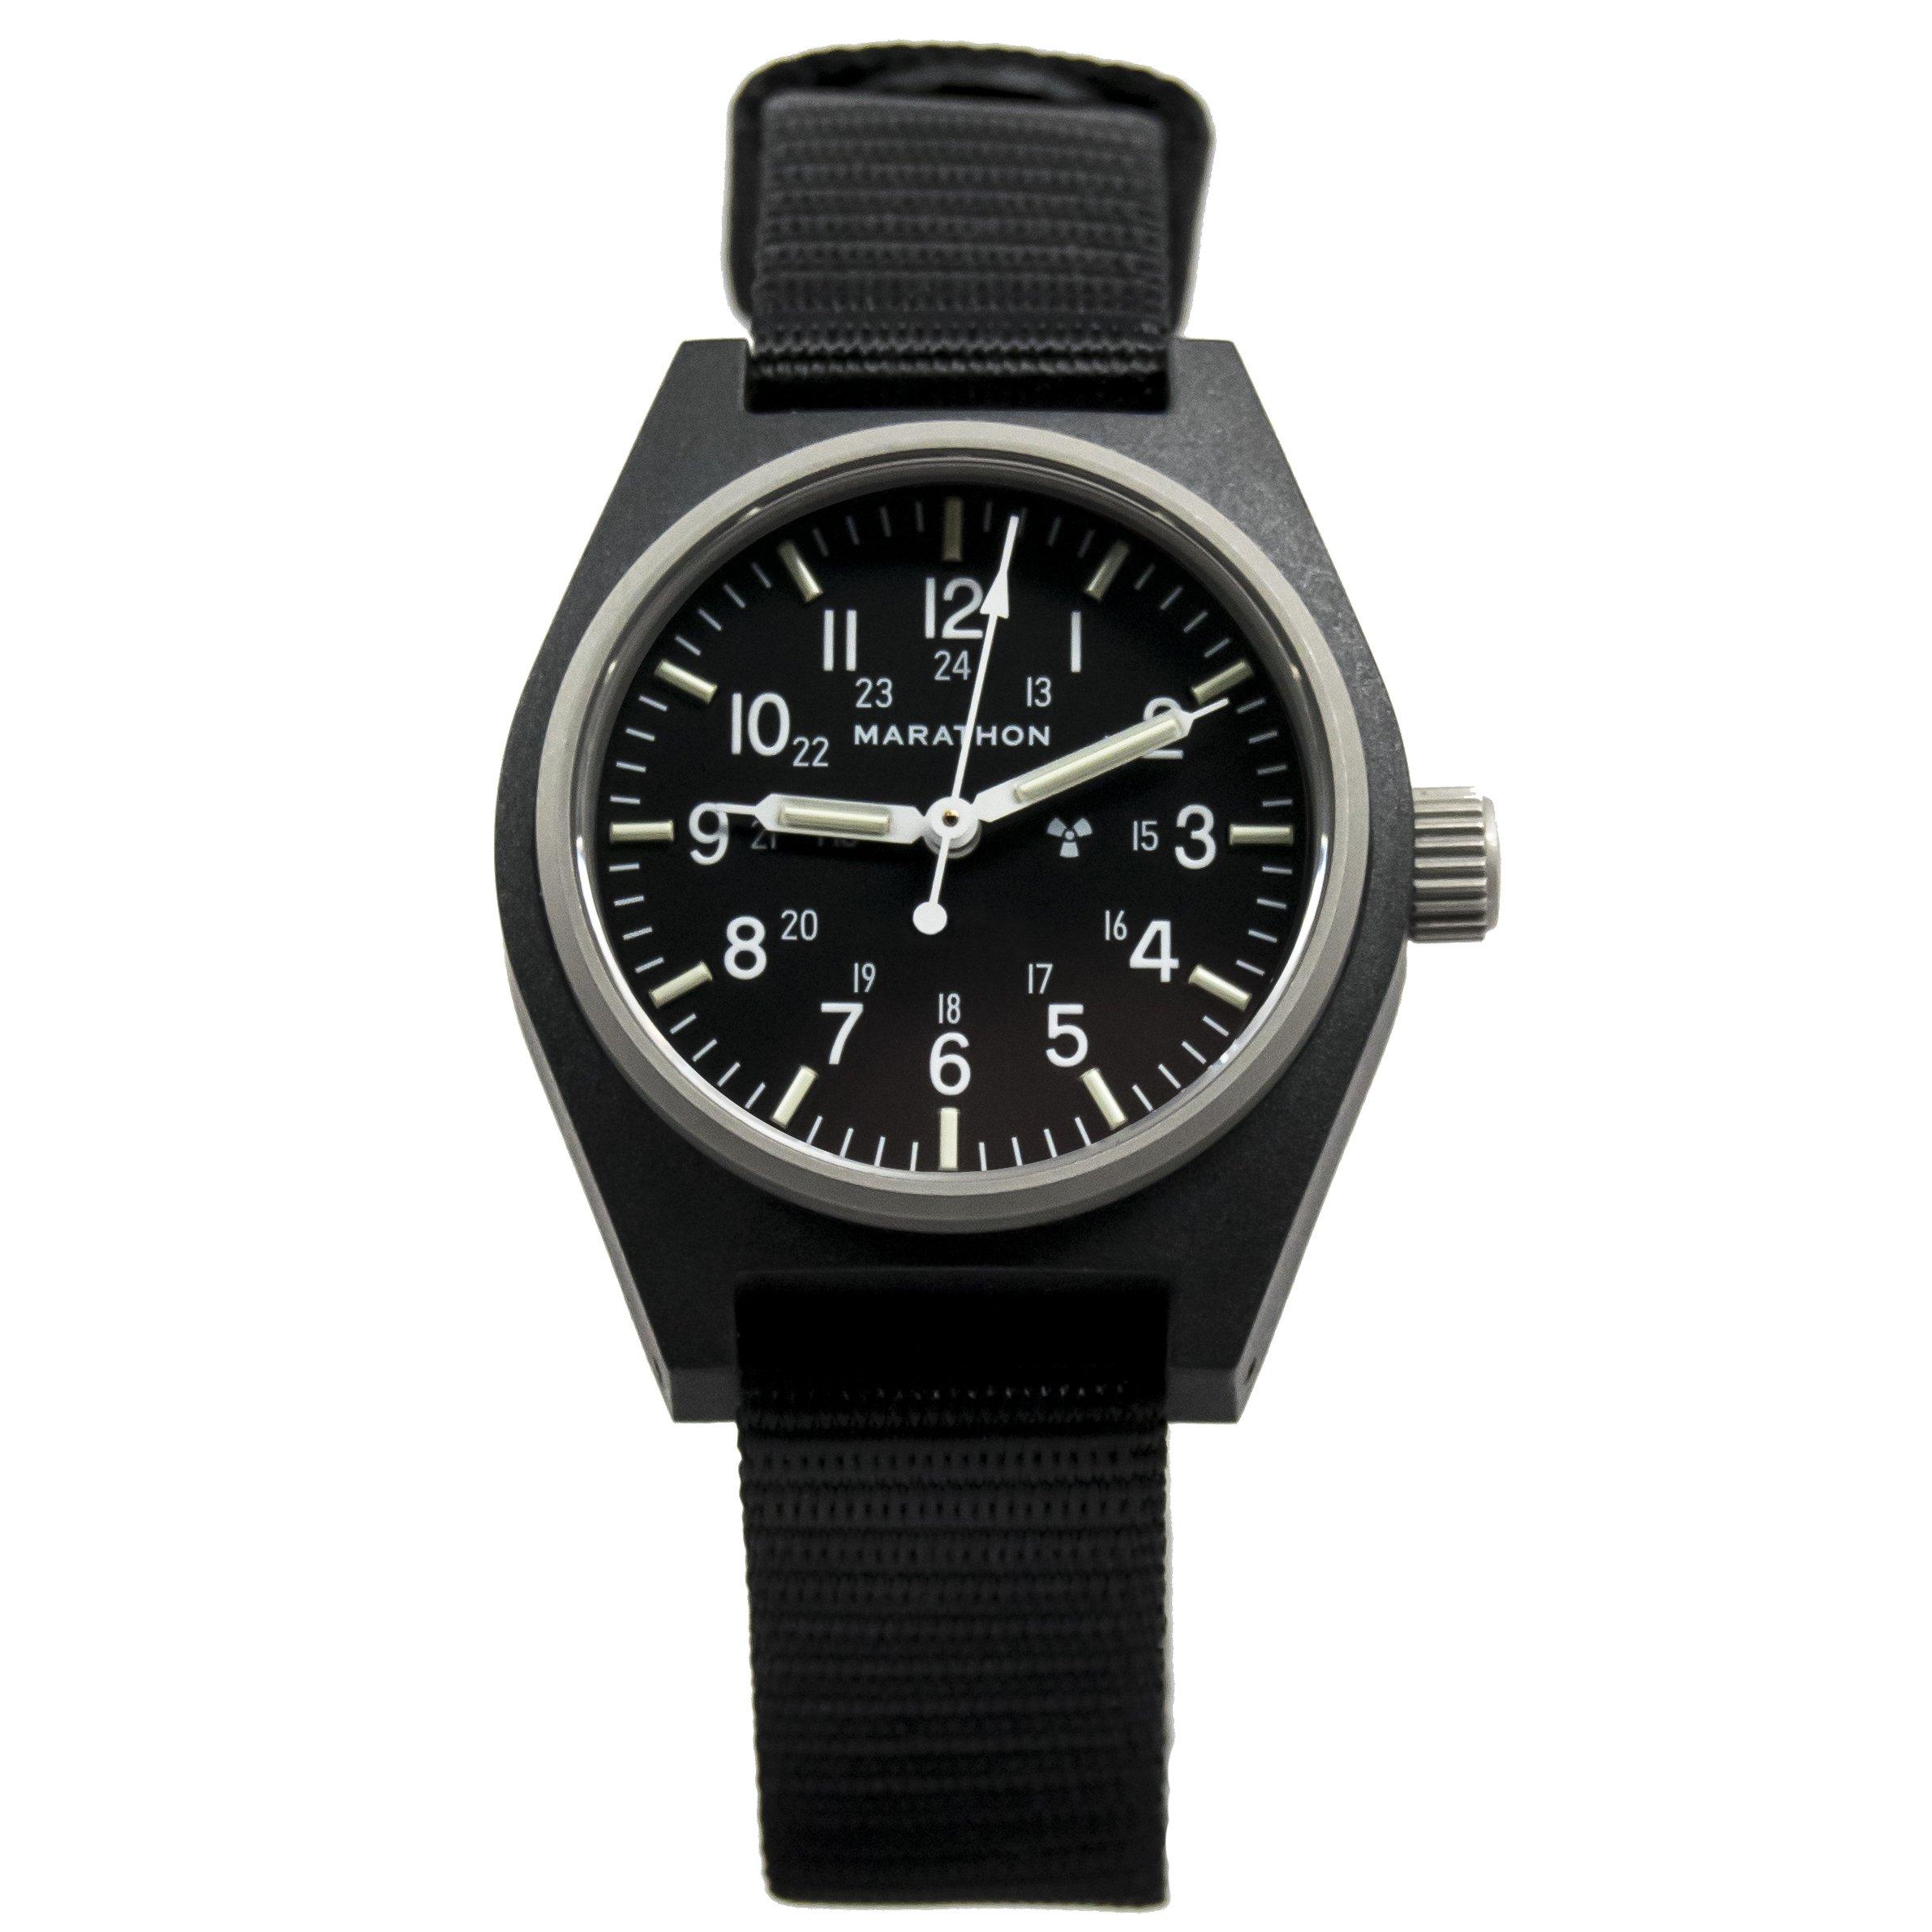 MARATHON WW194003BK-NGM General Purpose Mechanical (GPM) Military Field Watch with Tritium and Sapphire Glass (Black-NGM)